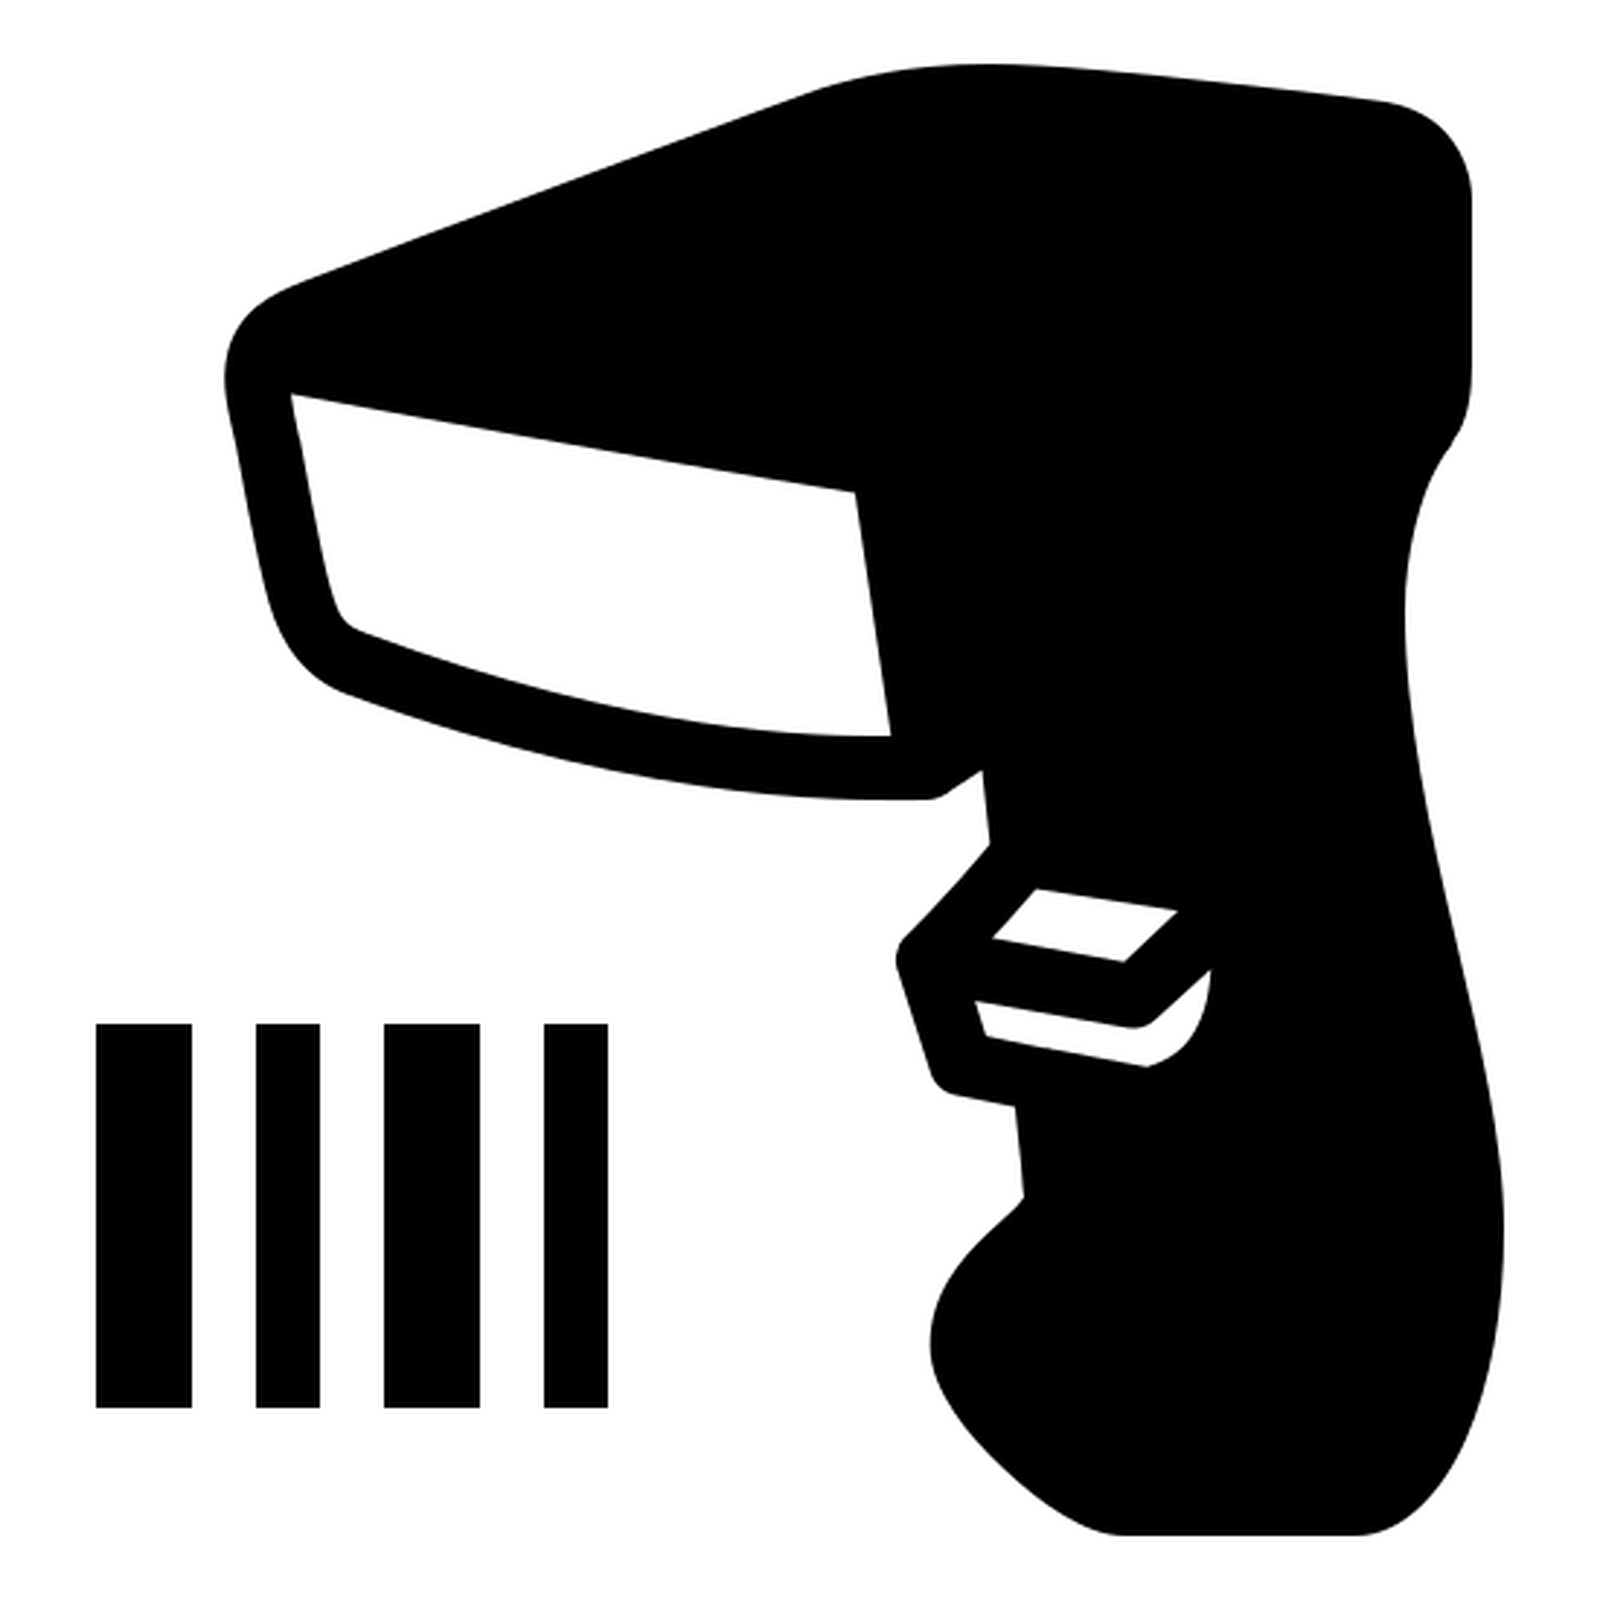 Scanner de código de barras 2 icon